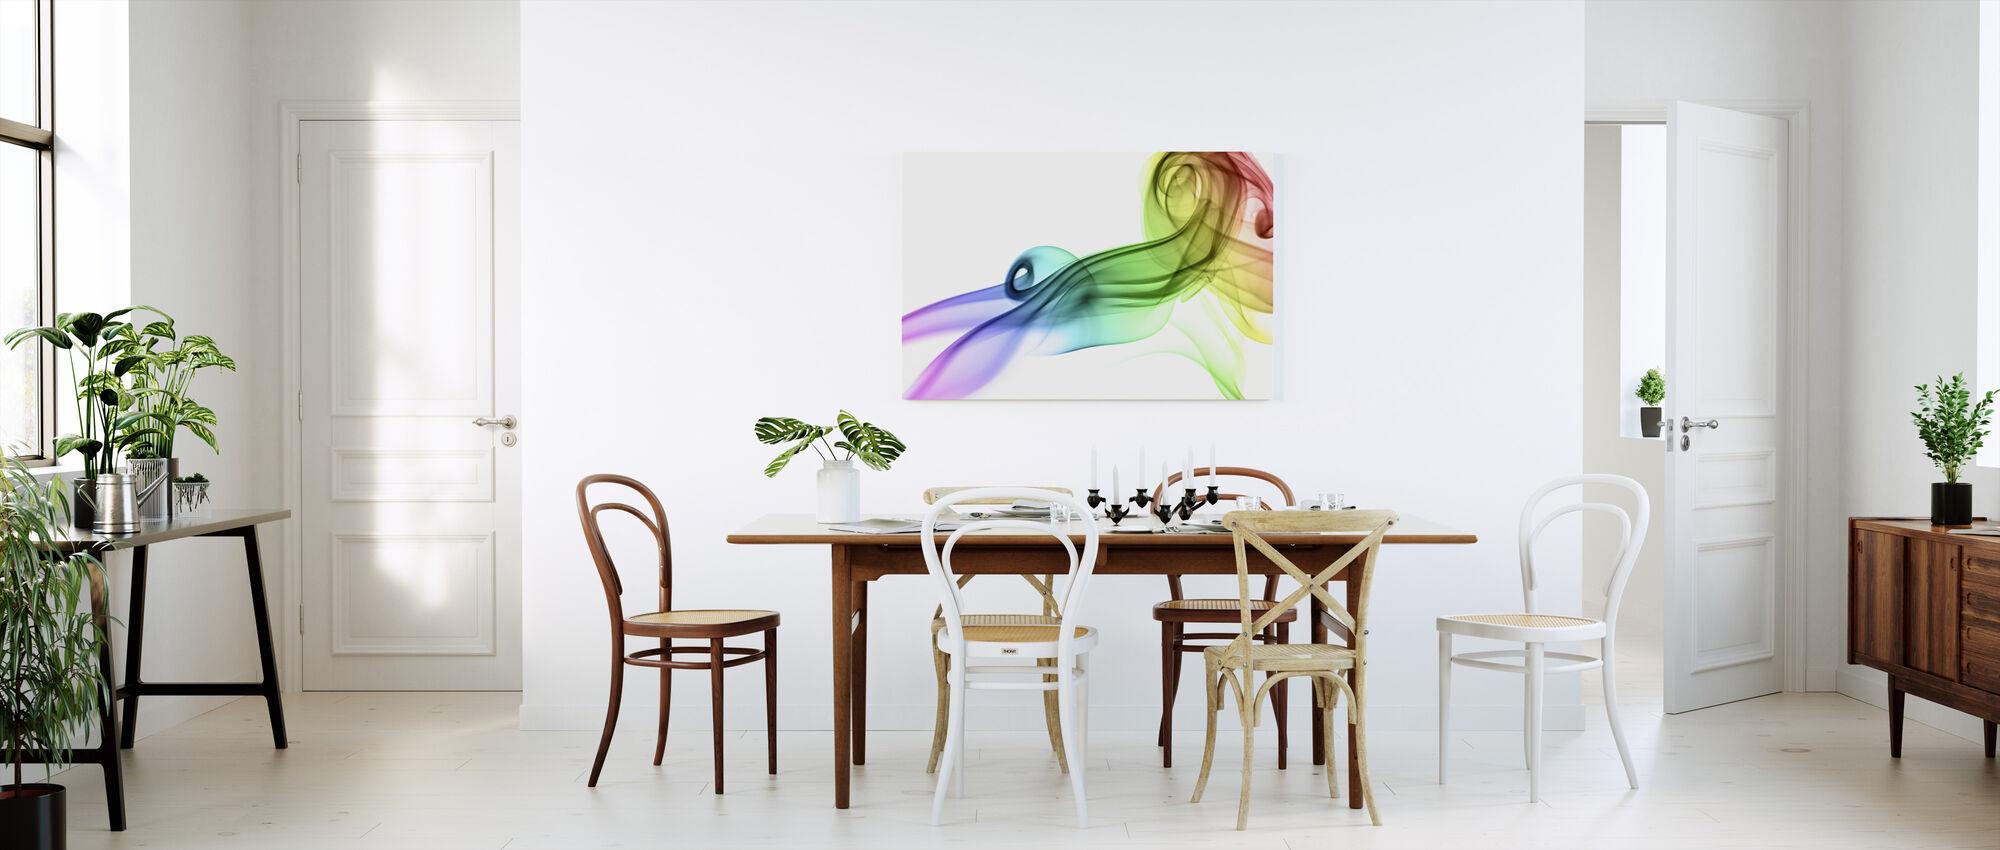 Colored Smoke - Canvas print - Kitchen